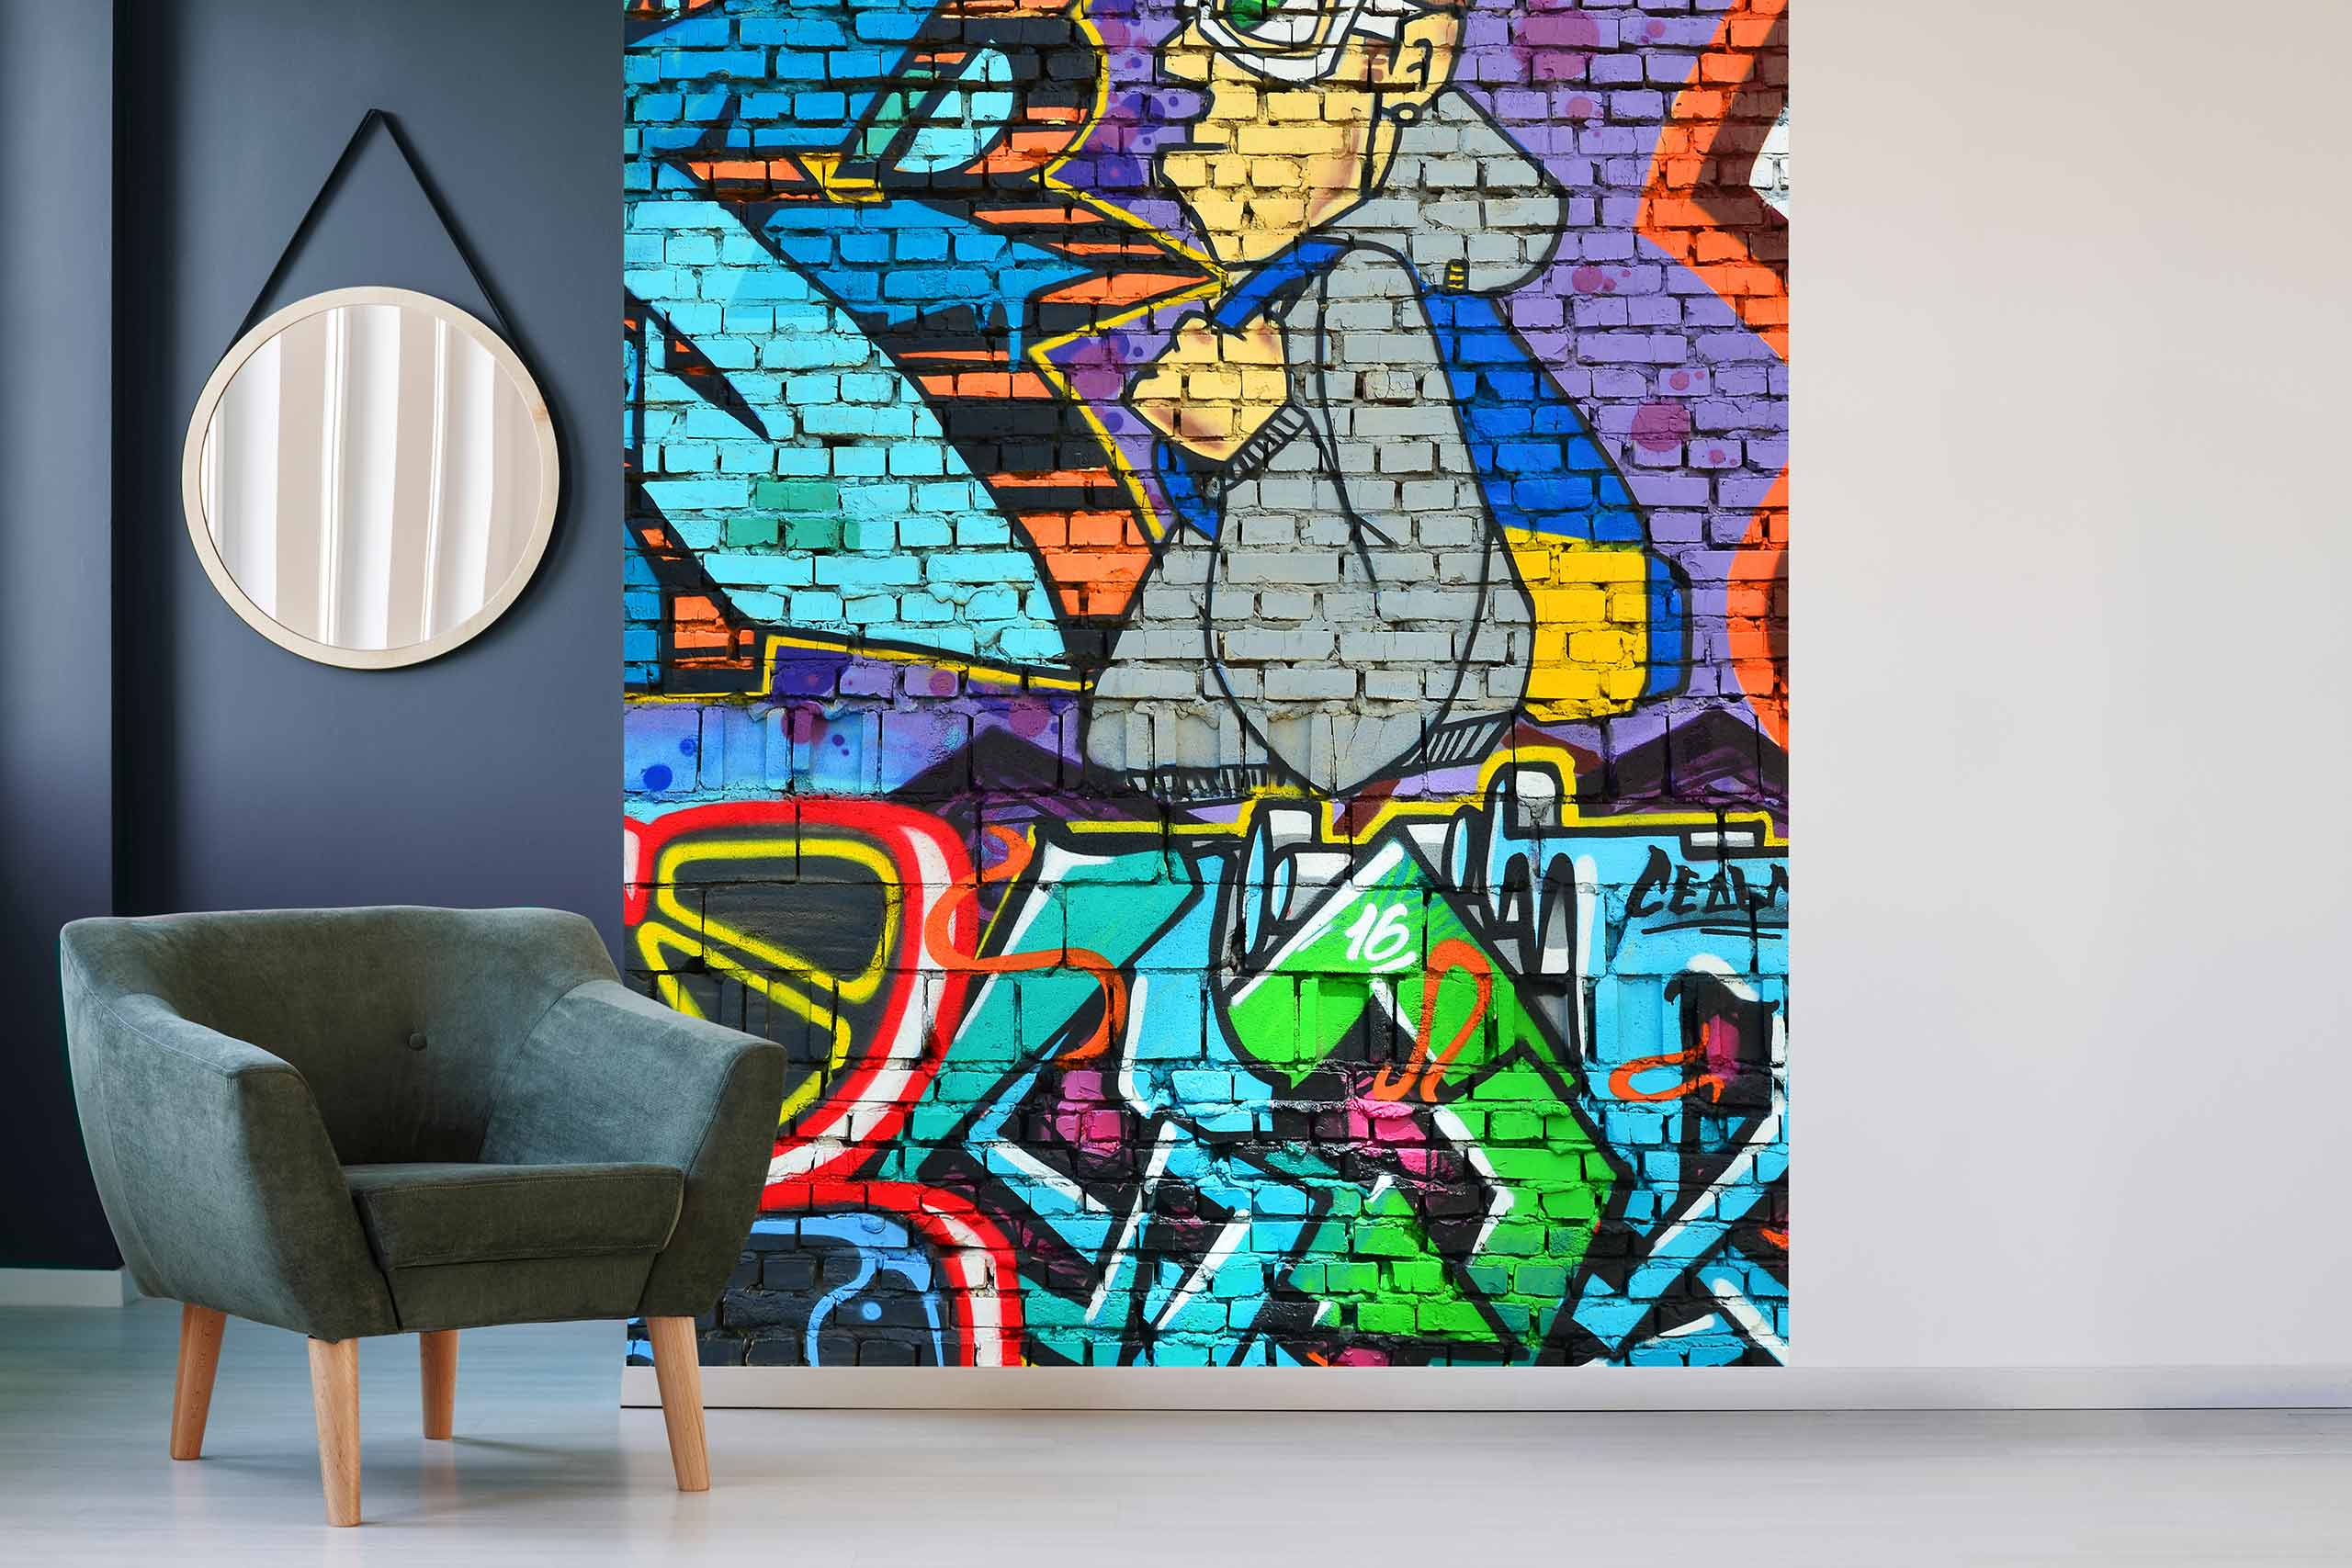 Vlies Tapete 225 Fototapete Höhe 250cm Motiv 135 Graffiti